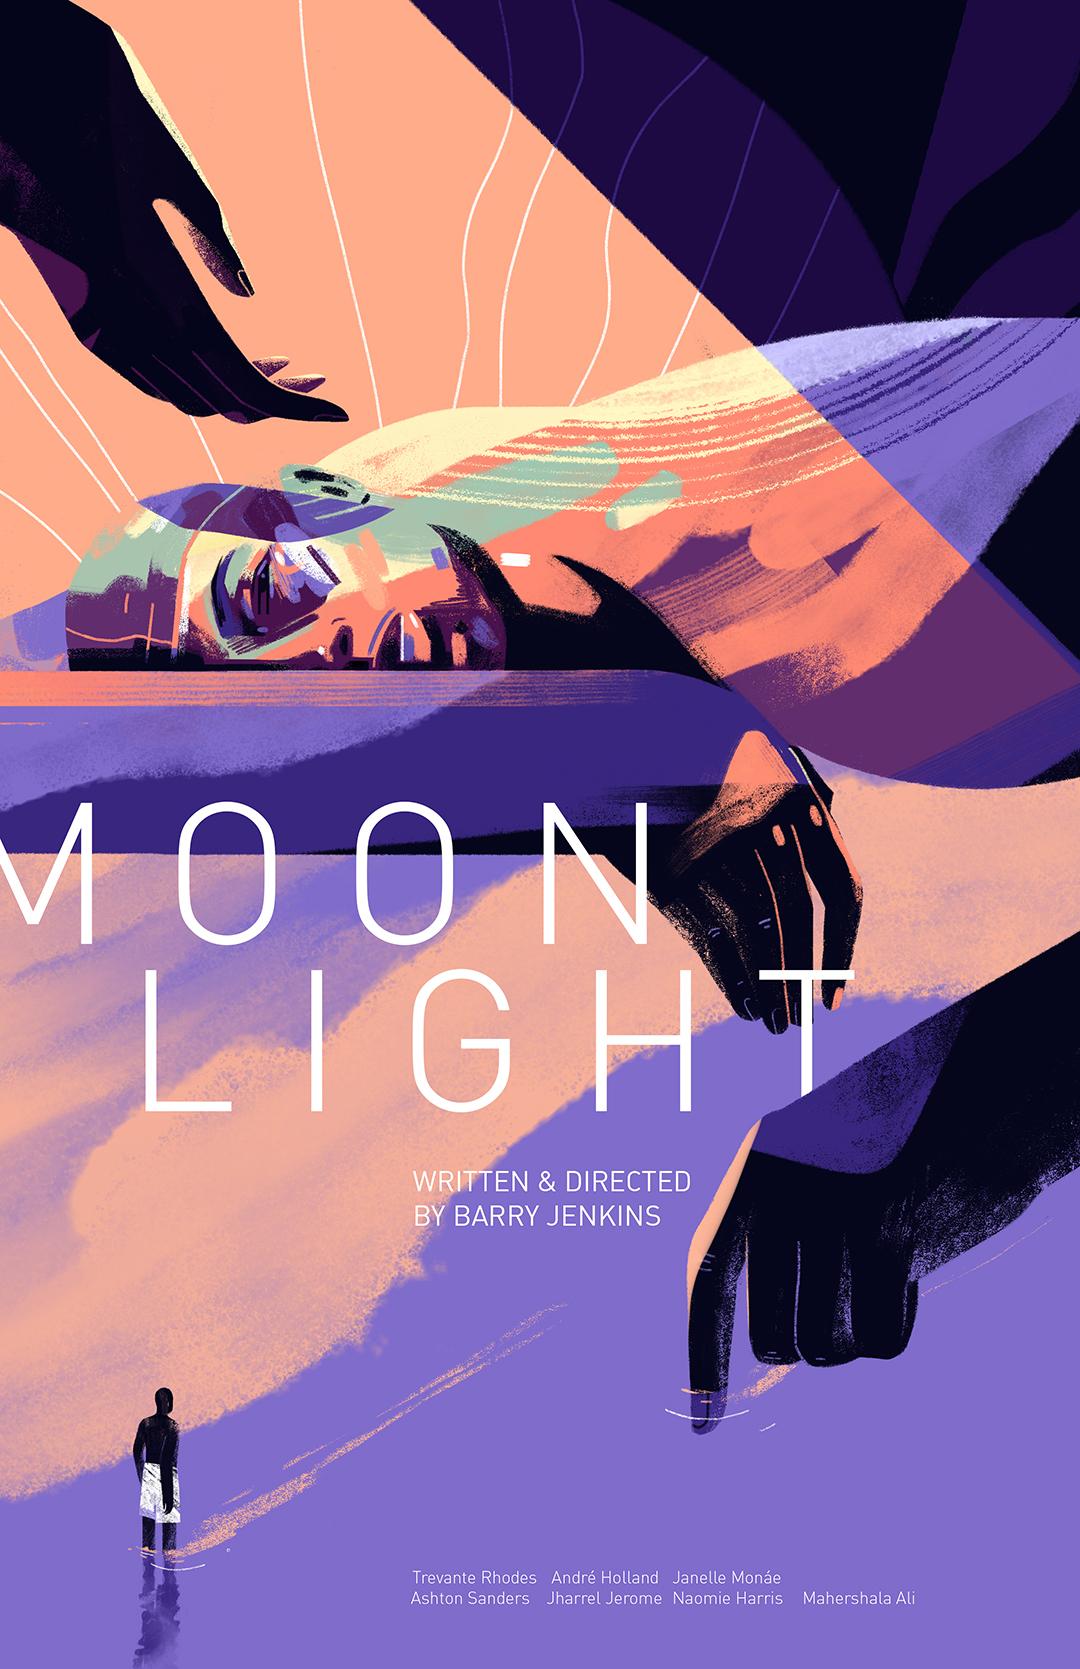 GirlsclubAsia-Illustrator-SaraWong-moonlight_color_FINAL